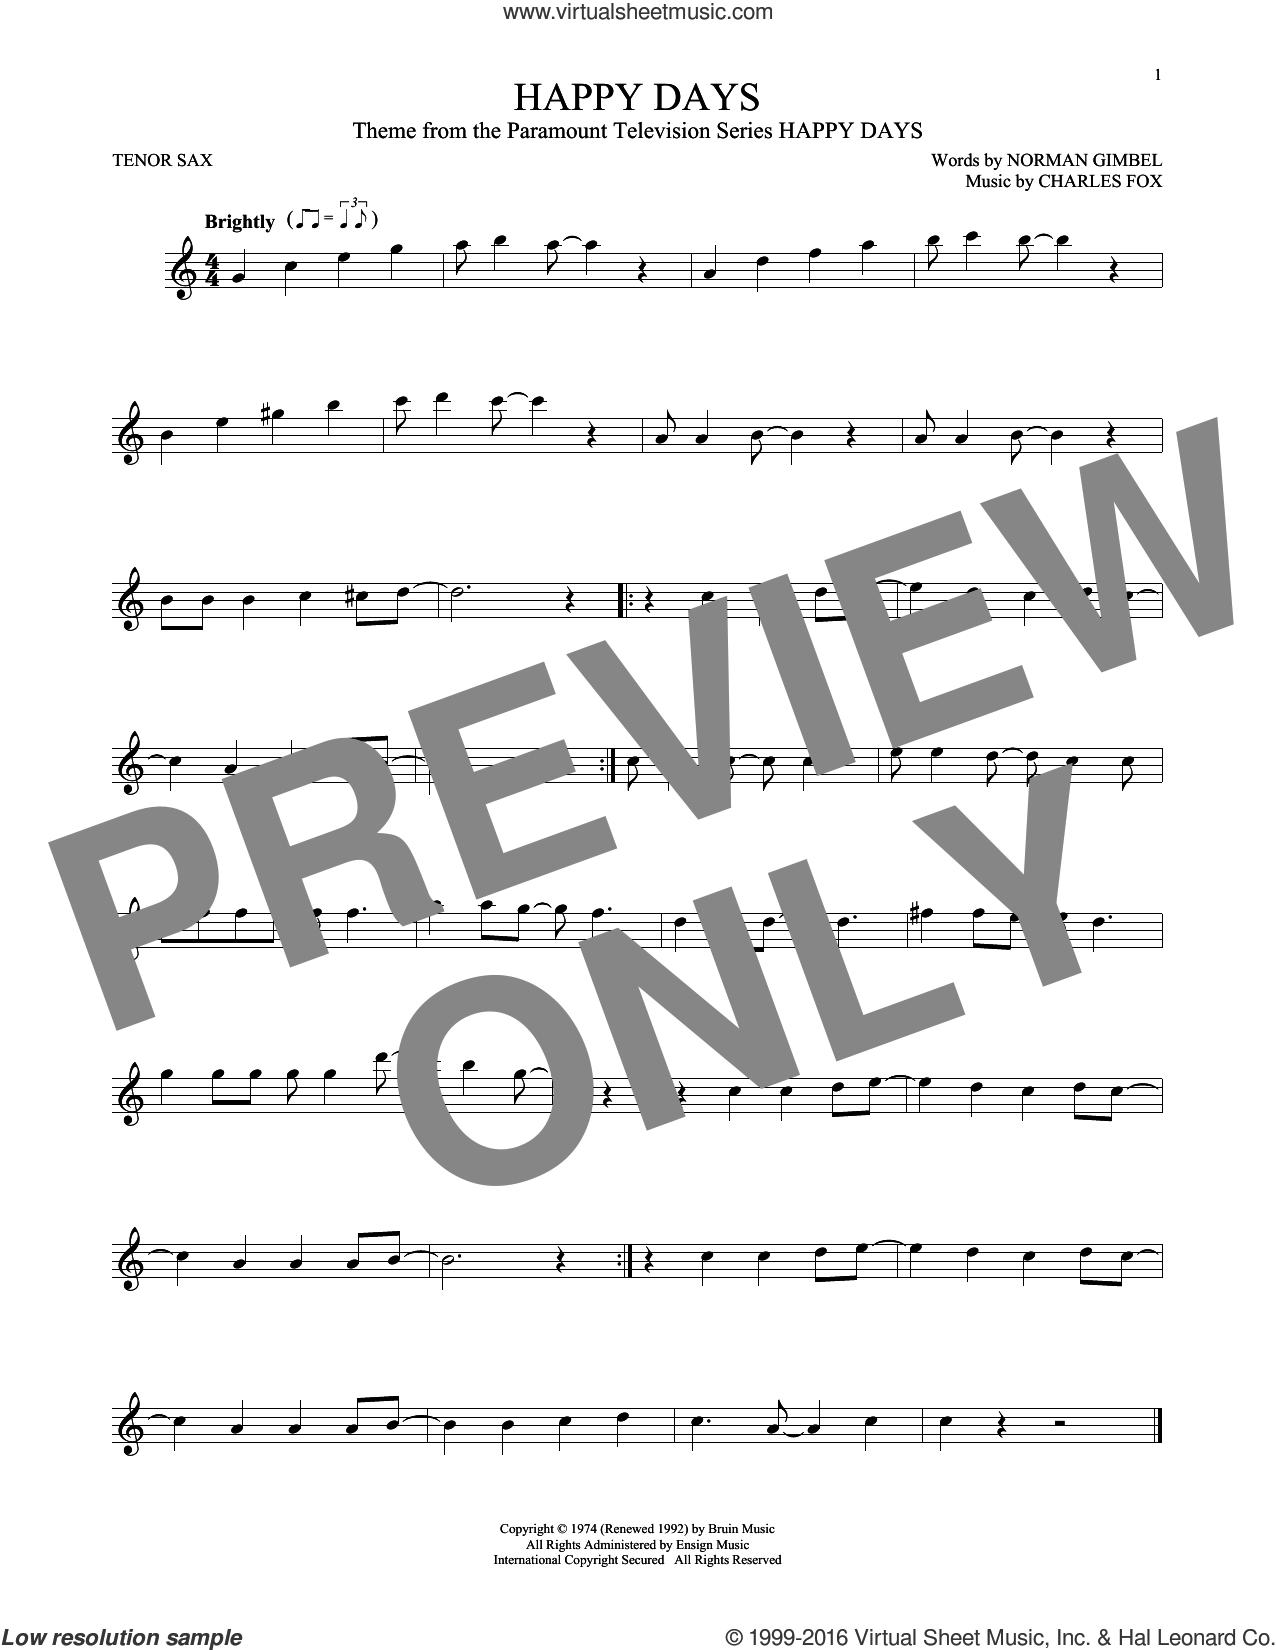 Happy Days sheet music for tenor saxophone solo by Norman Gimbel, Charles Fox, Norman Gimbel & Charles Fox and Pratt and McClain, intermediate skill level